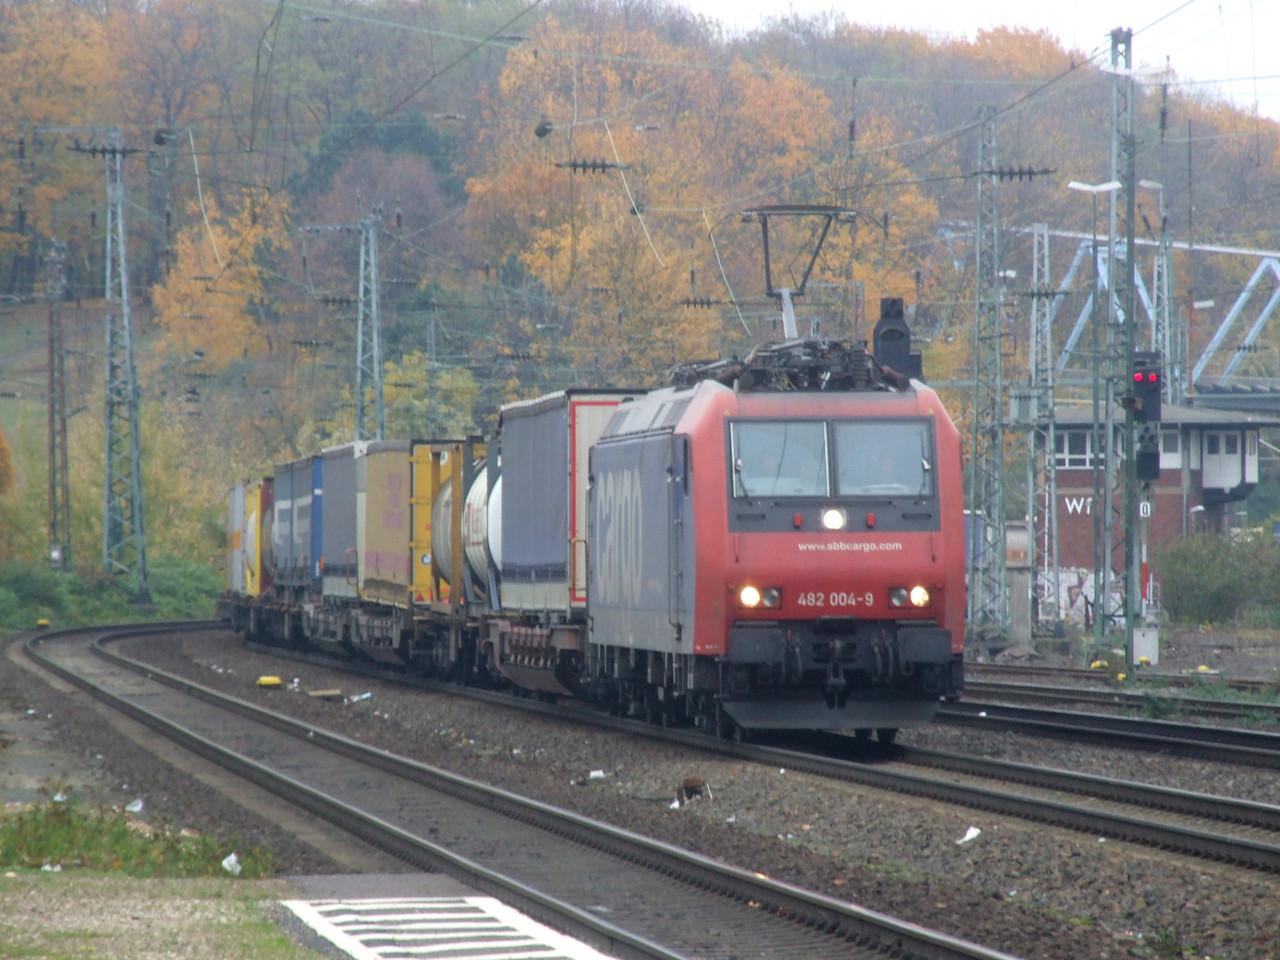 SBB Cargo 482 004 at Köln West, 13th November 2012.